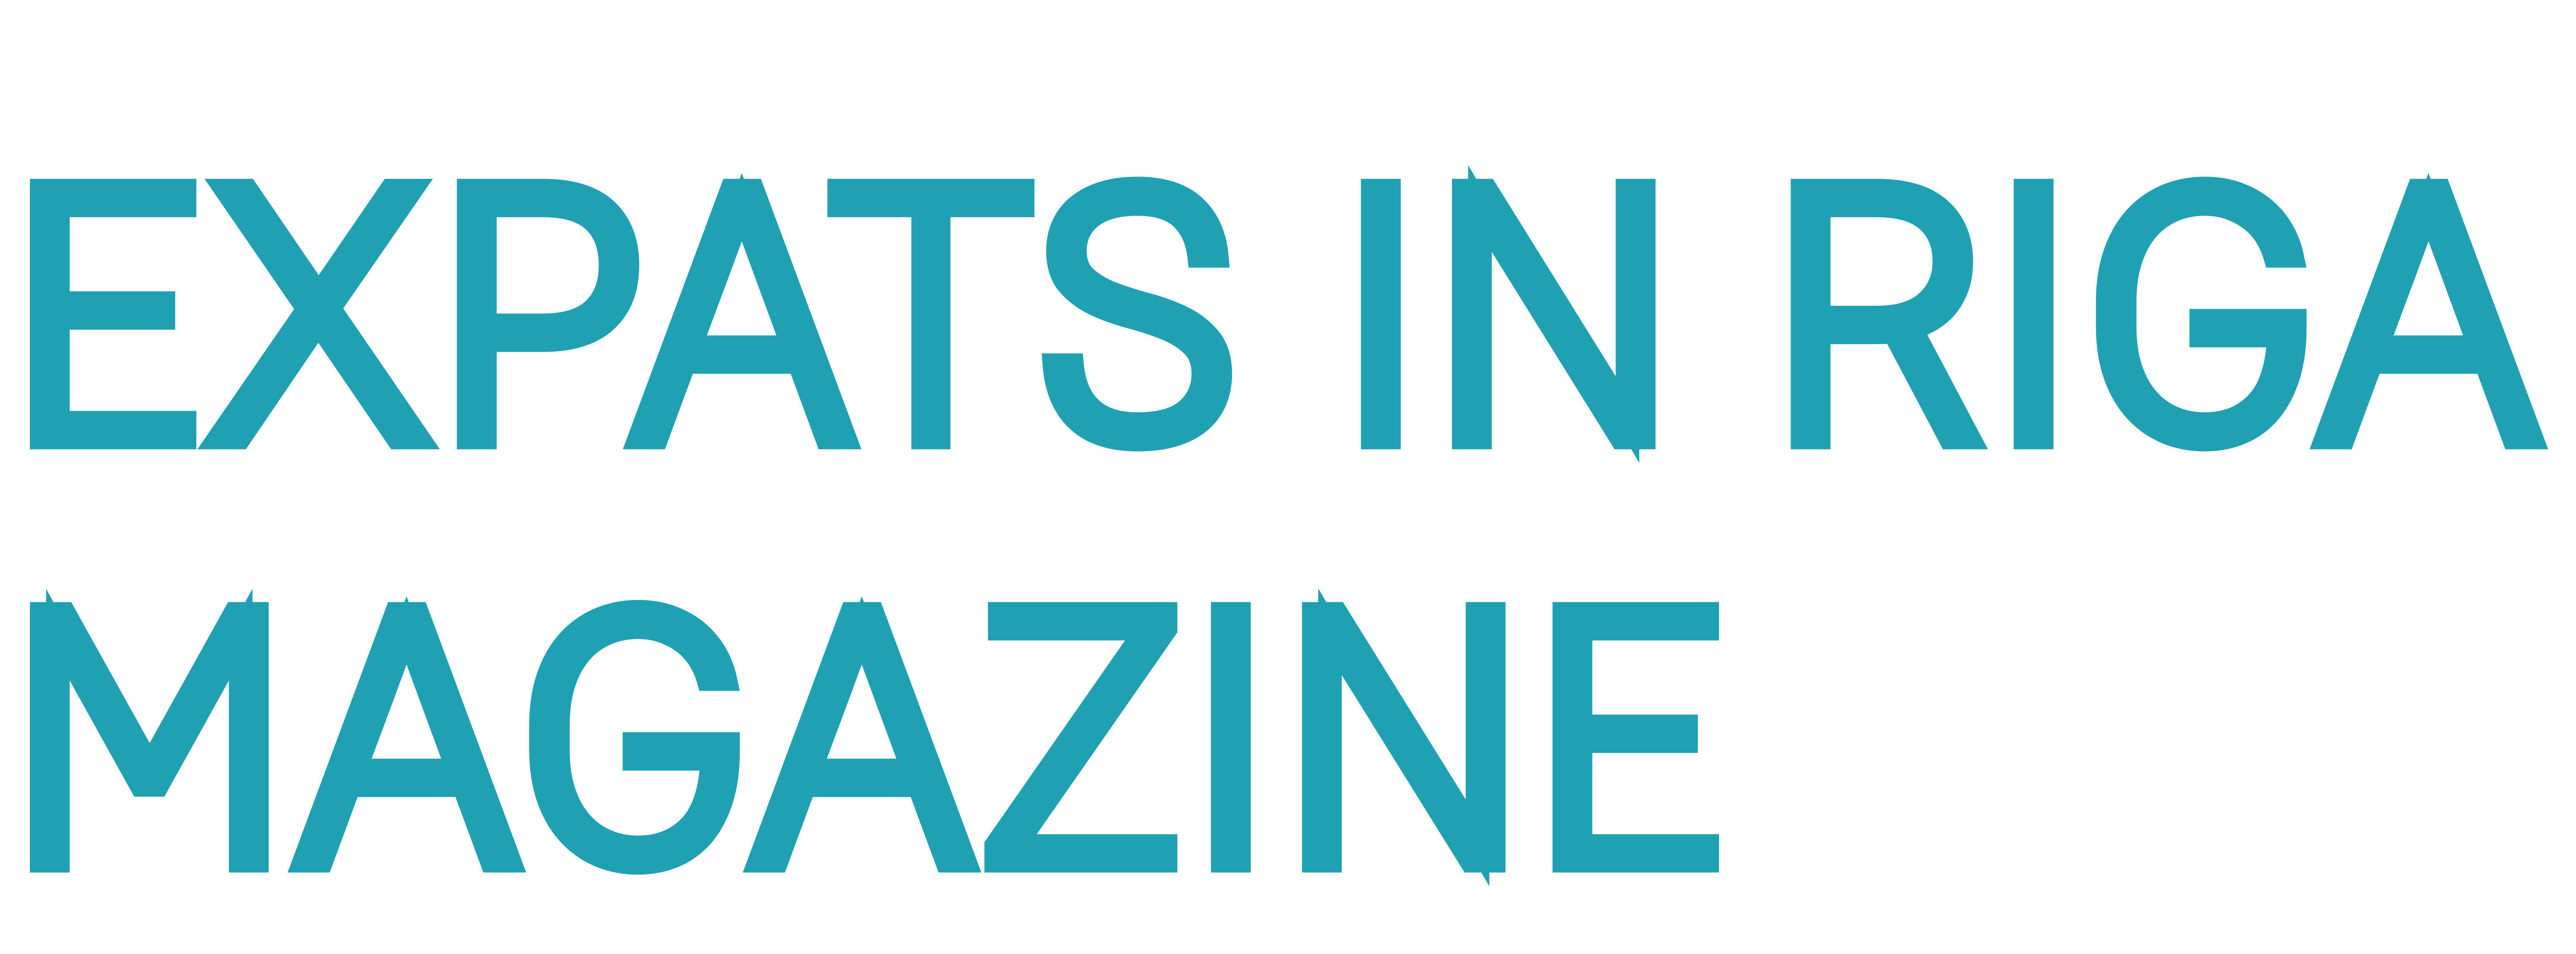 Expats in Riga Magazine